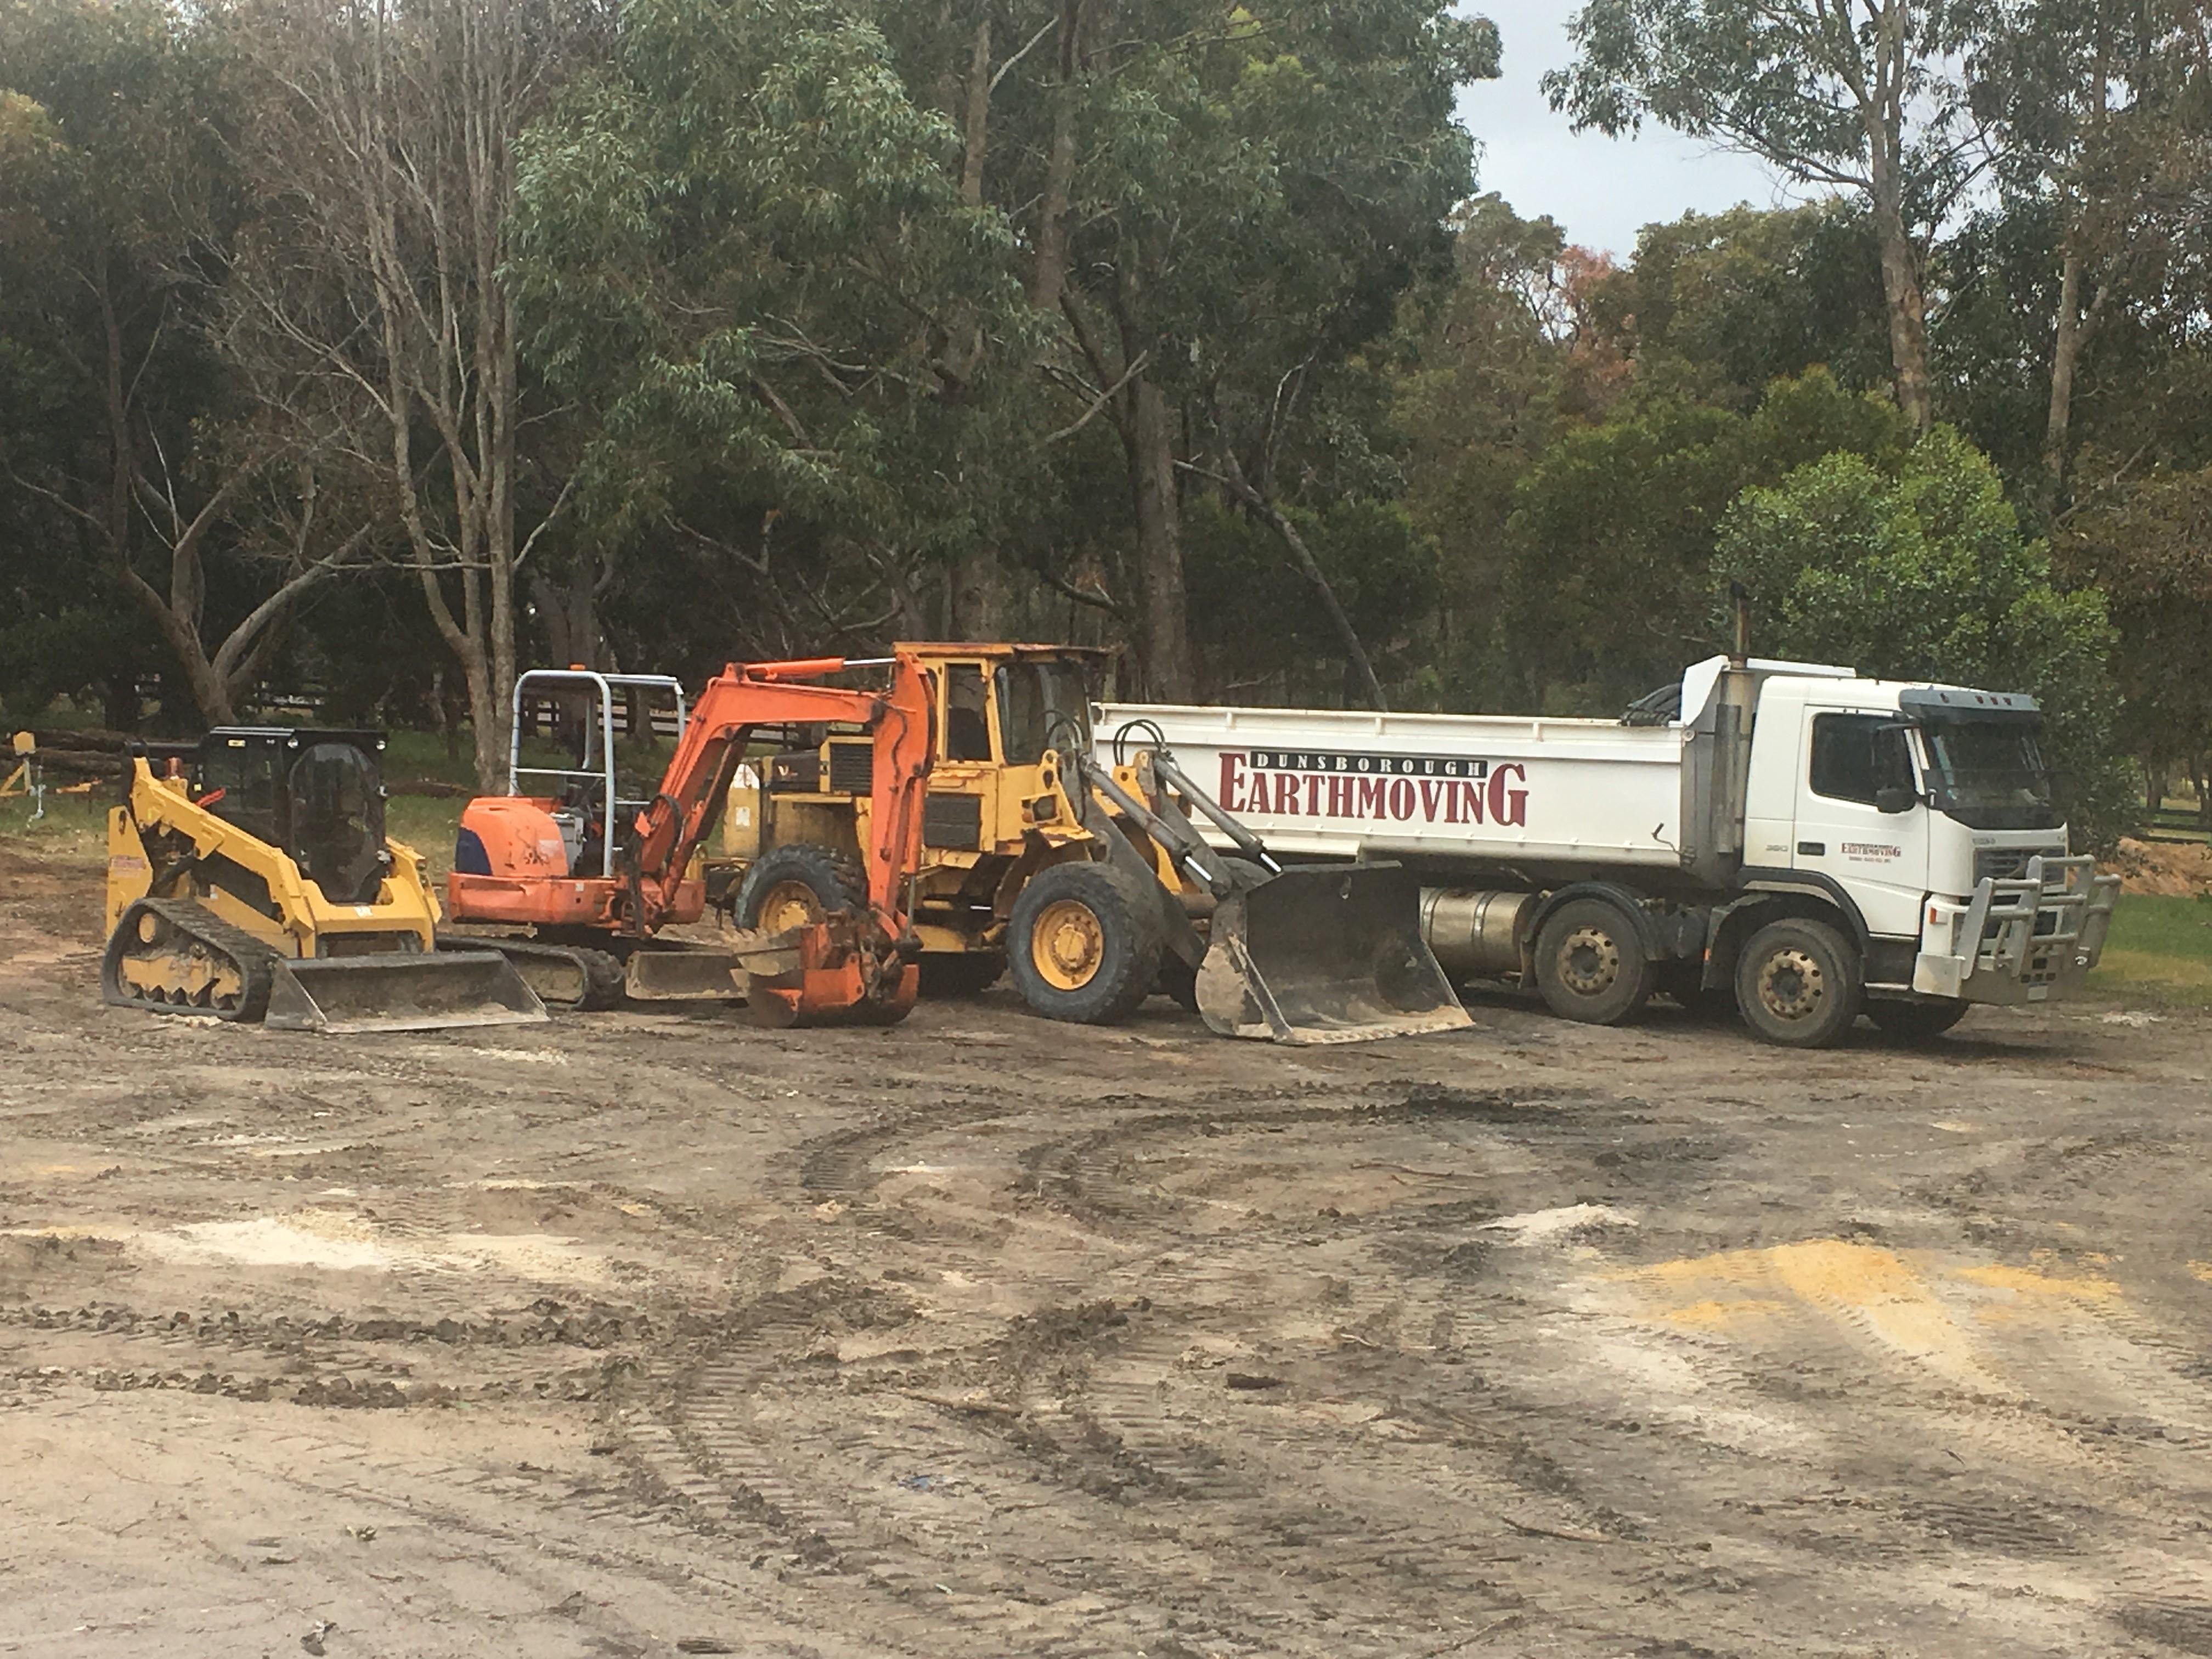 Dunsborough Earthmoving & Cartage - Excavation & Earthmoving